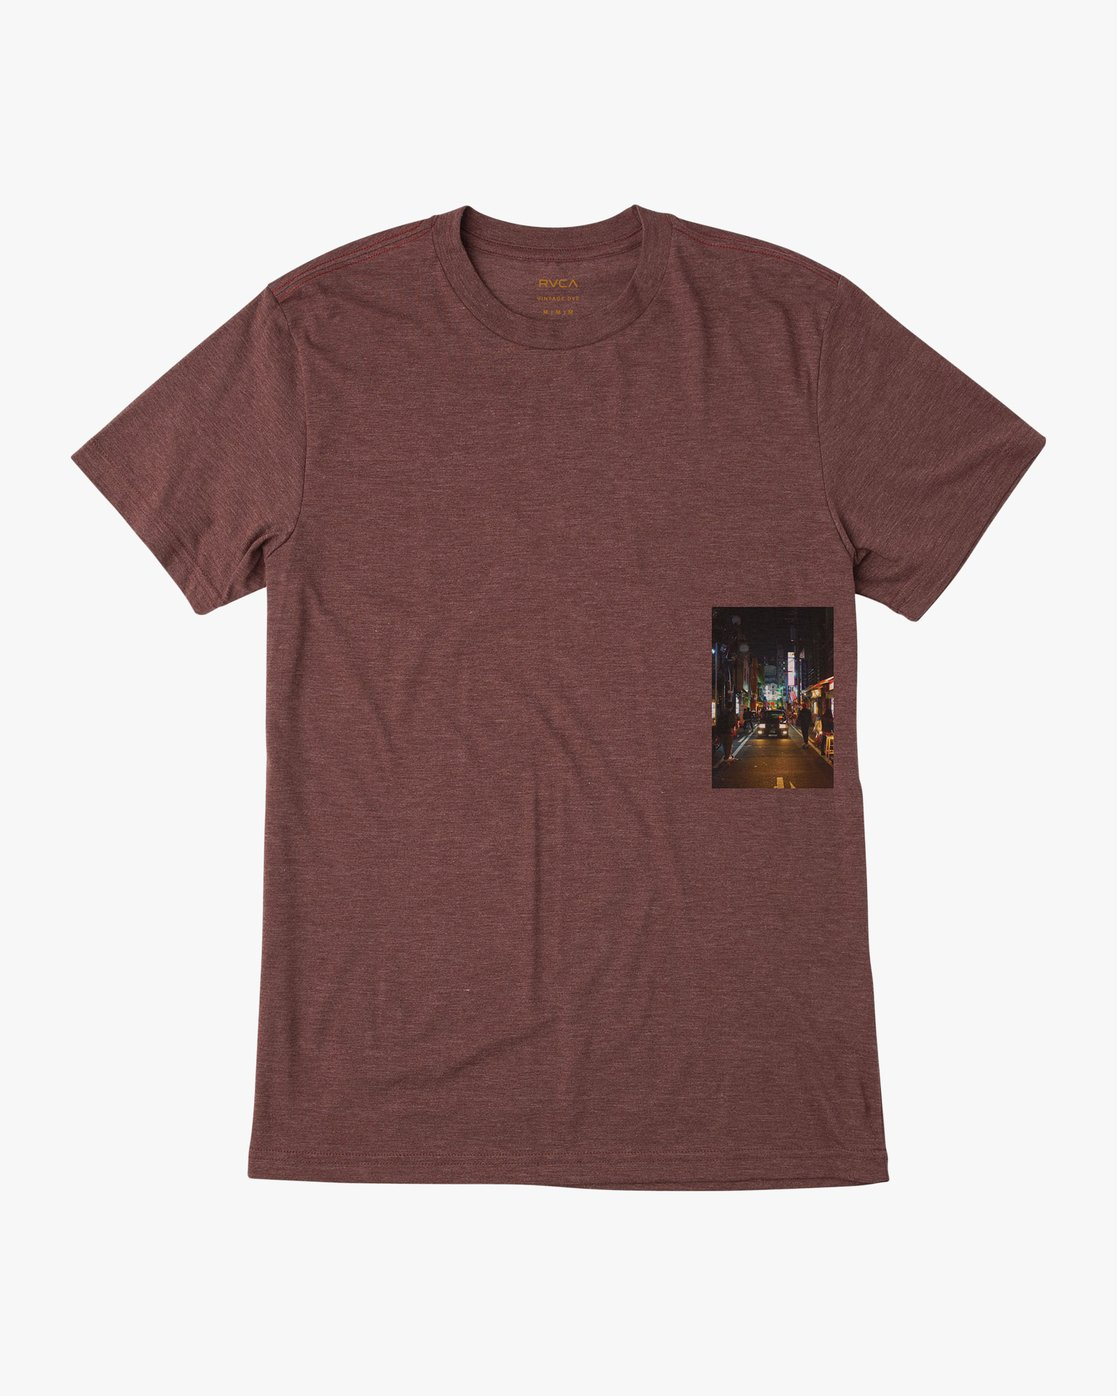 0 Curren Caples Photo T-Shirt Red M420QRCU RVCA